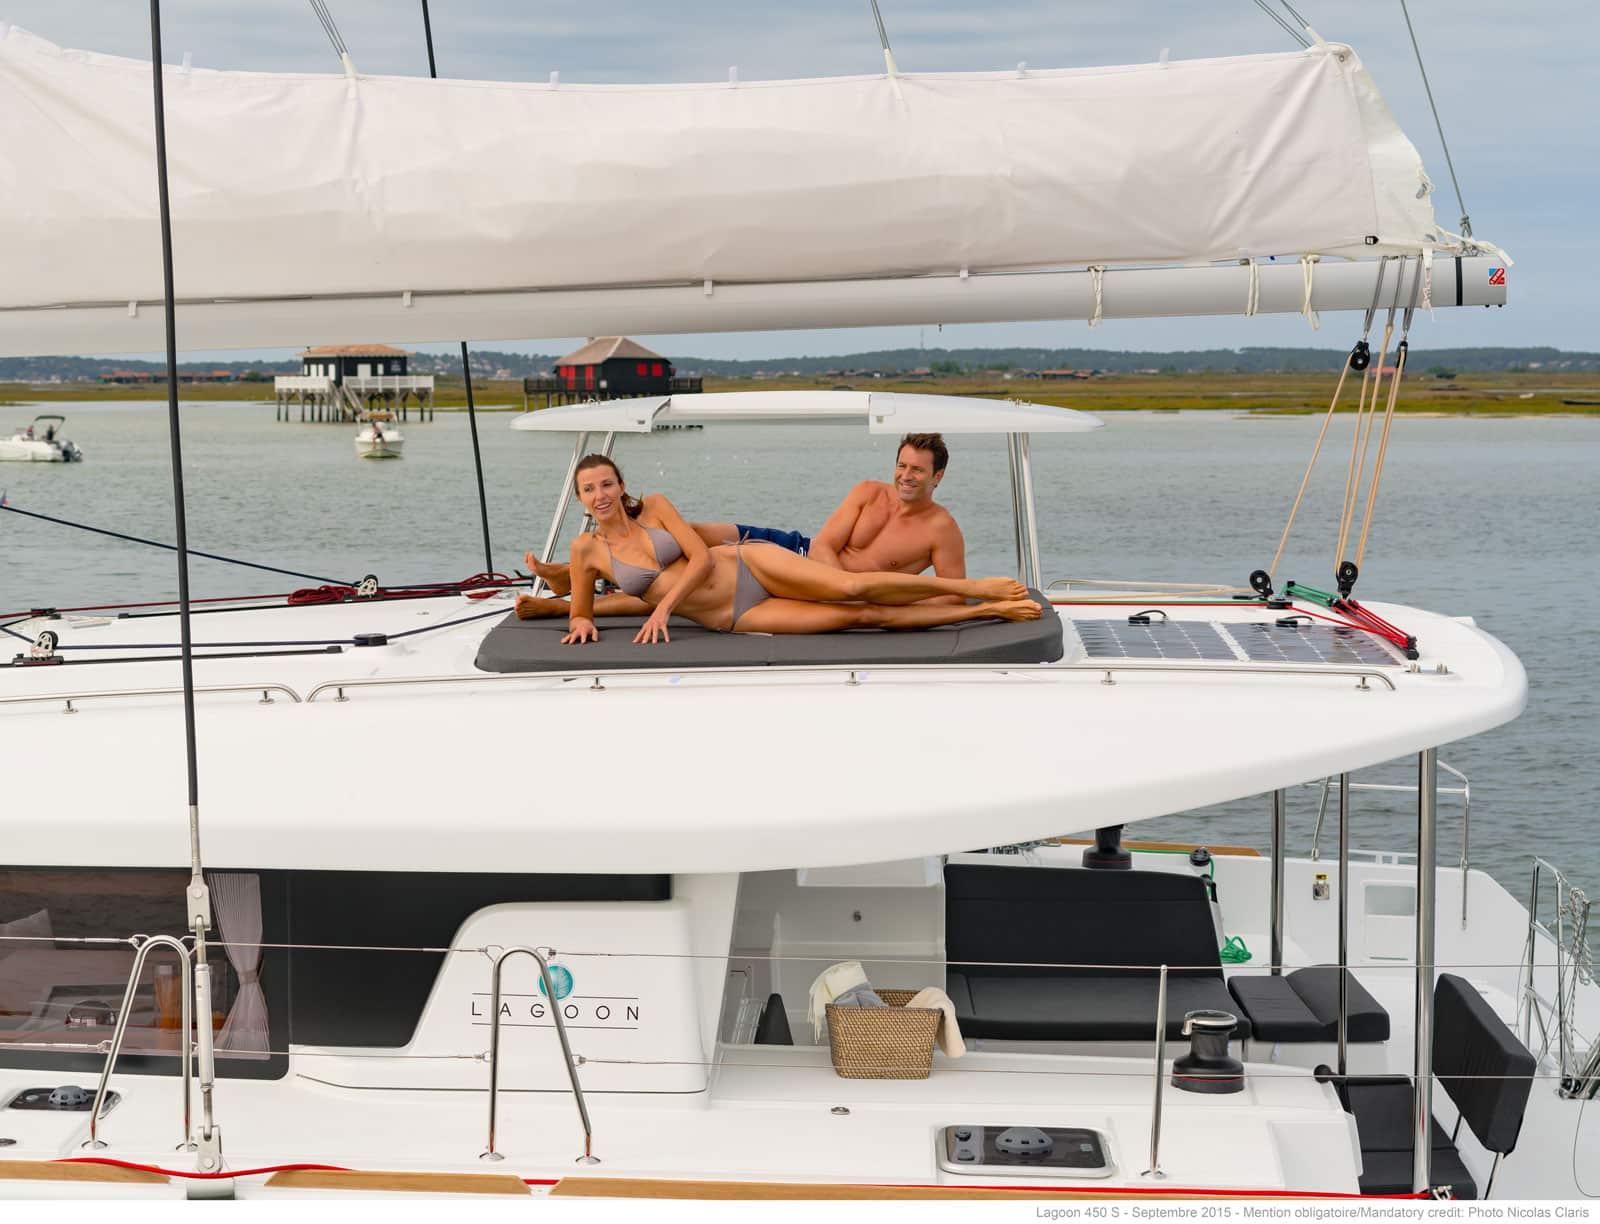 lagoon 450 S-yacht-charter-croatia-sailing-holidays-croatia-booking-yacht-charter-croatia-catamarans-sailboats-motorboats-gulets-luxury-yachts-boat-rental-croatia 10